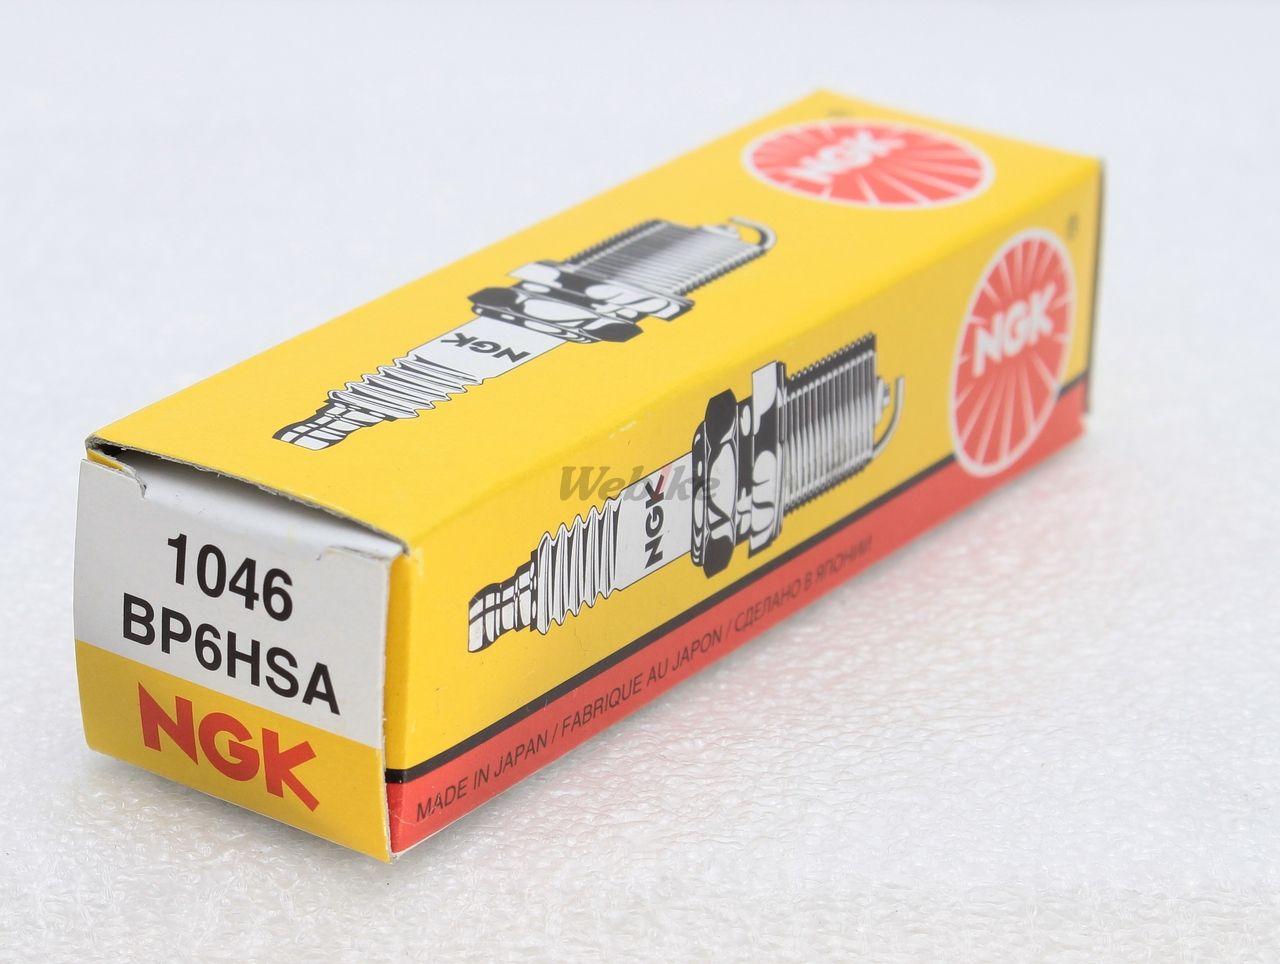 【NGK】標準型 火星塞 BP6HSA 1046 - 「Webike-摩托百貨」